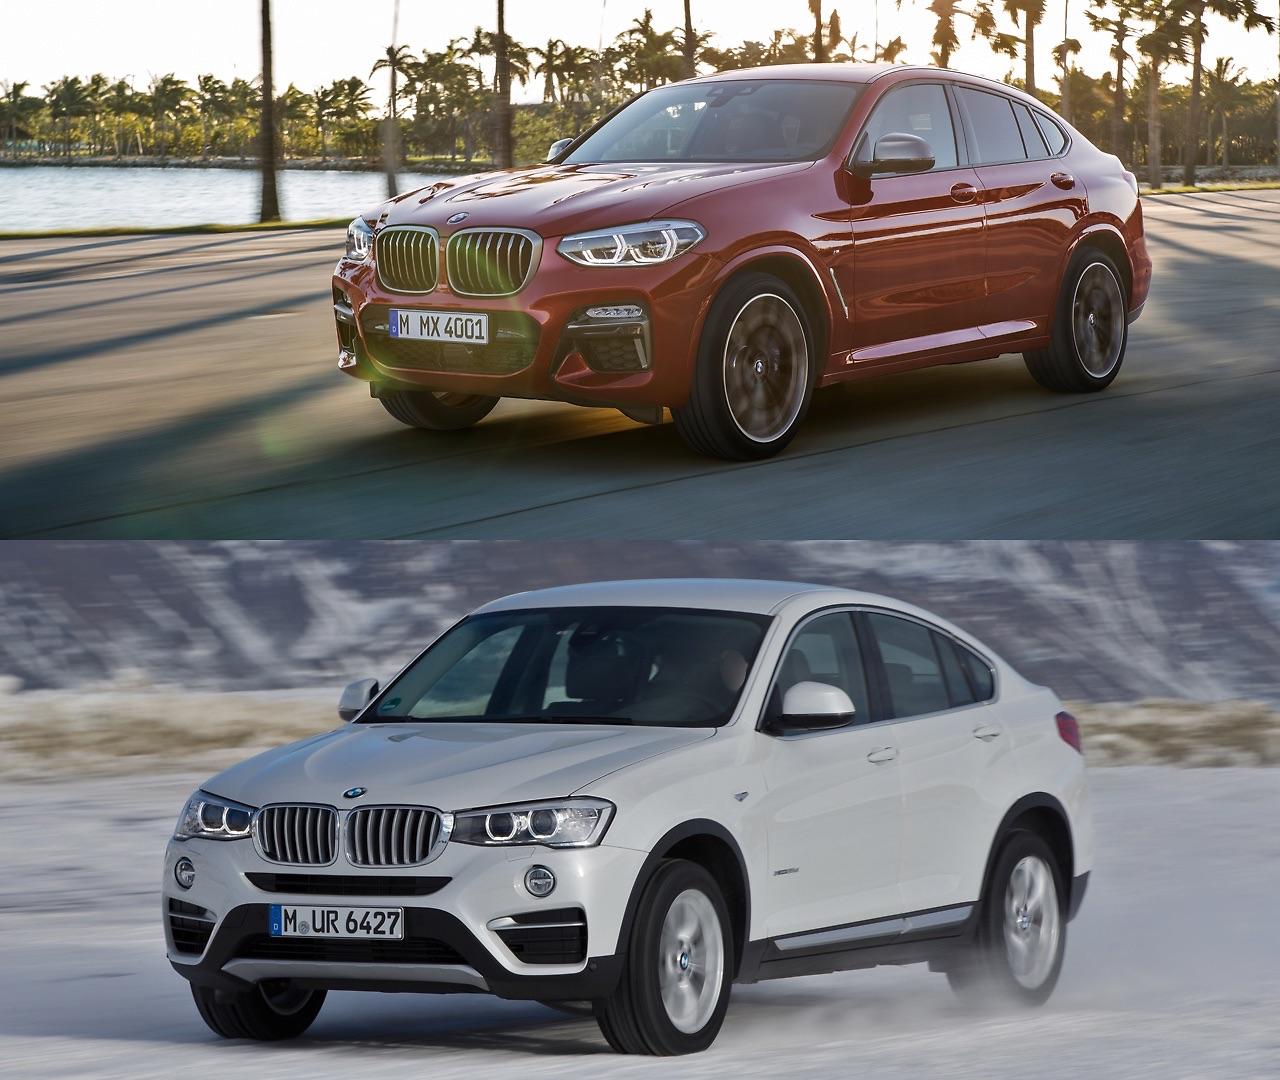 BMW X4 G02 versus BMW X4 F26